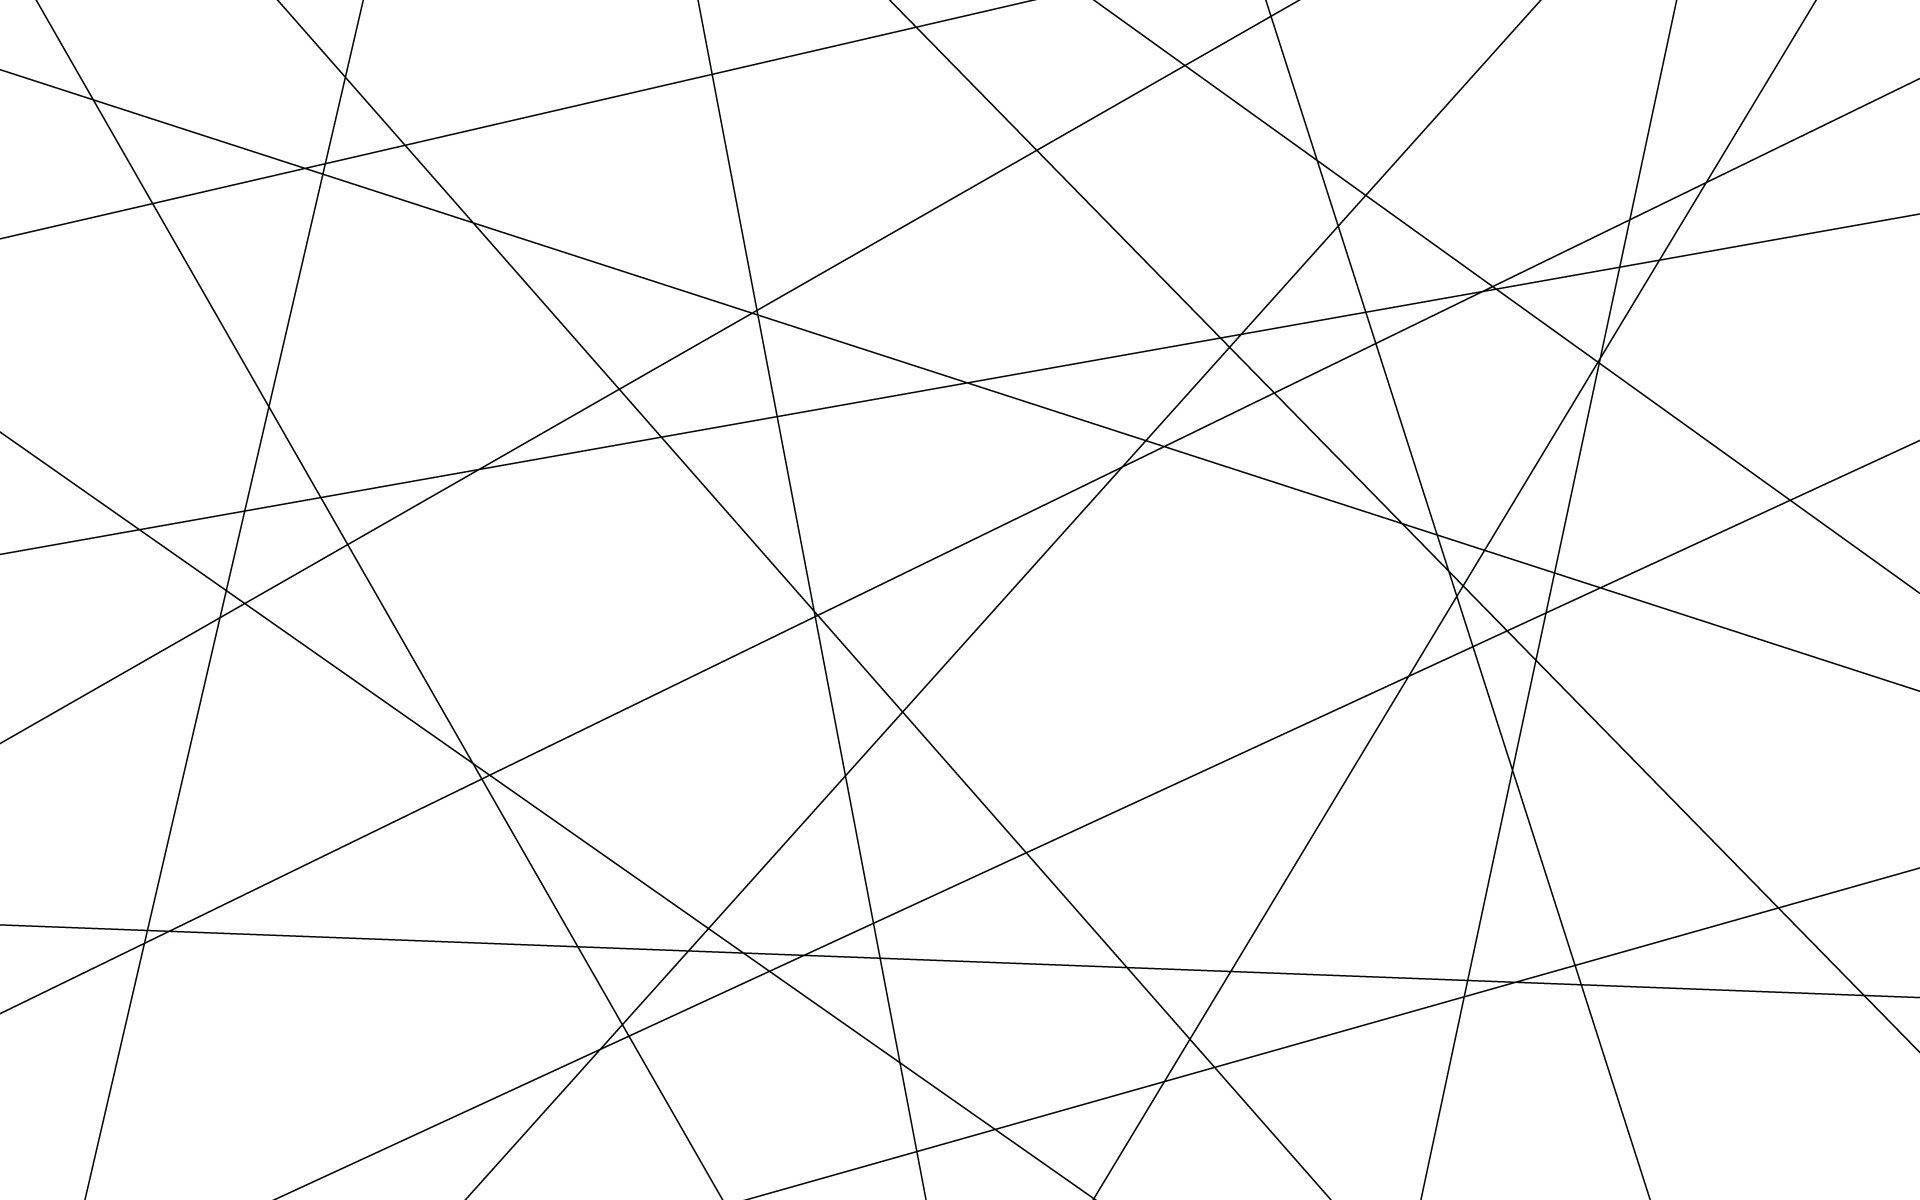 Res 1920x1200 Geometric Lines Desktop Wallpaper With 1920x1200